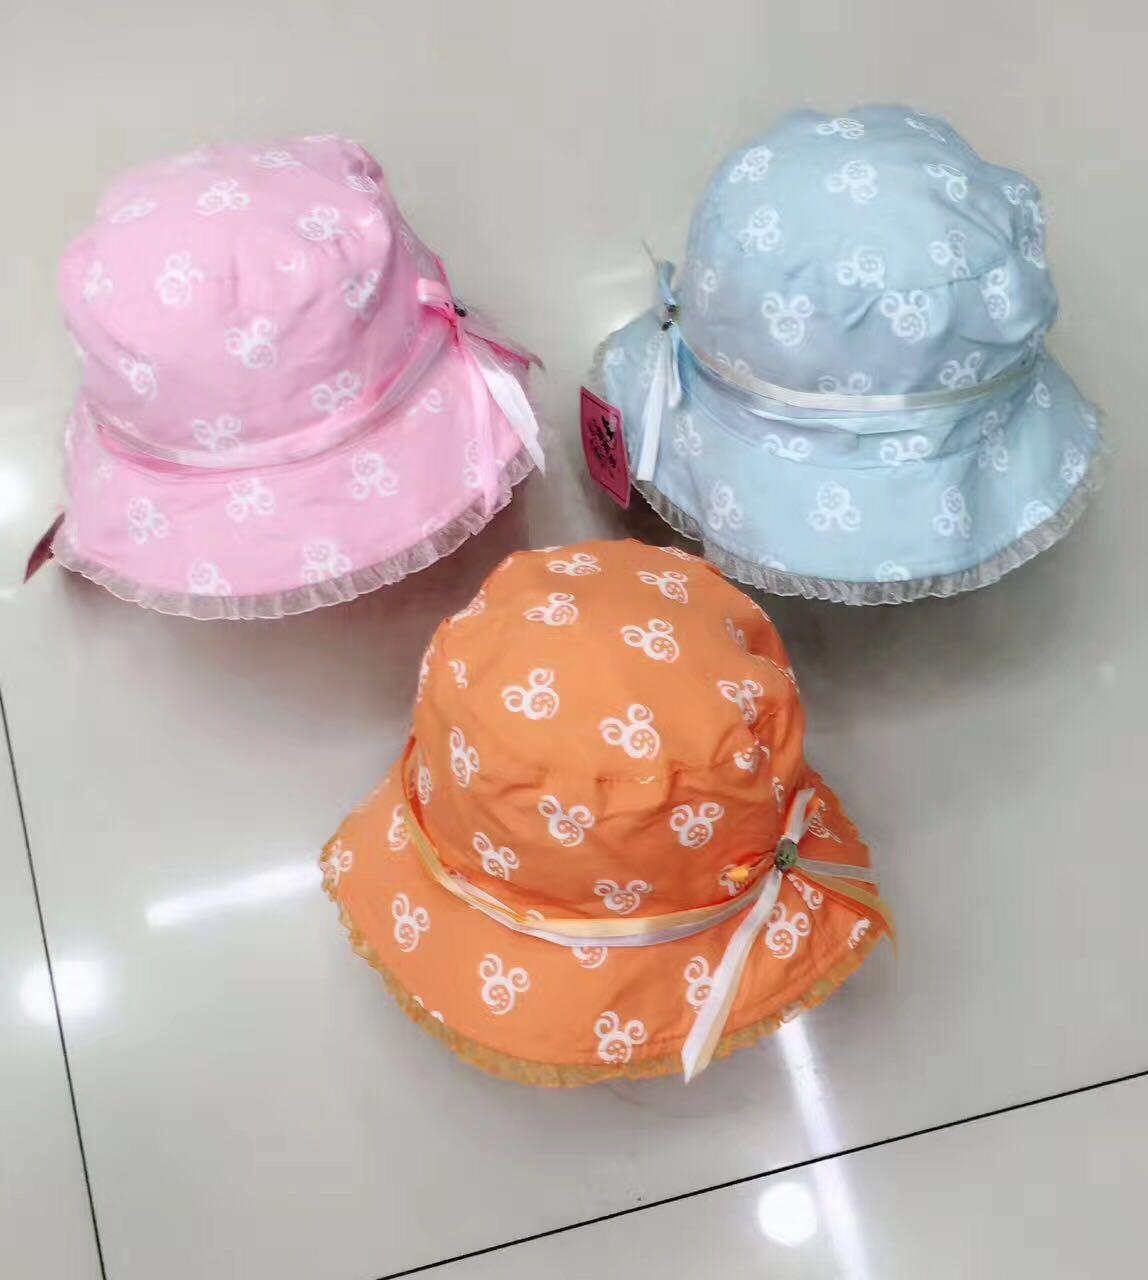 Mieszane Design Niemowlę Dziewczynka Sunhat Hat Cap Sun Hat 30pcs / Lot New